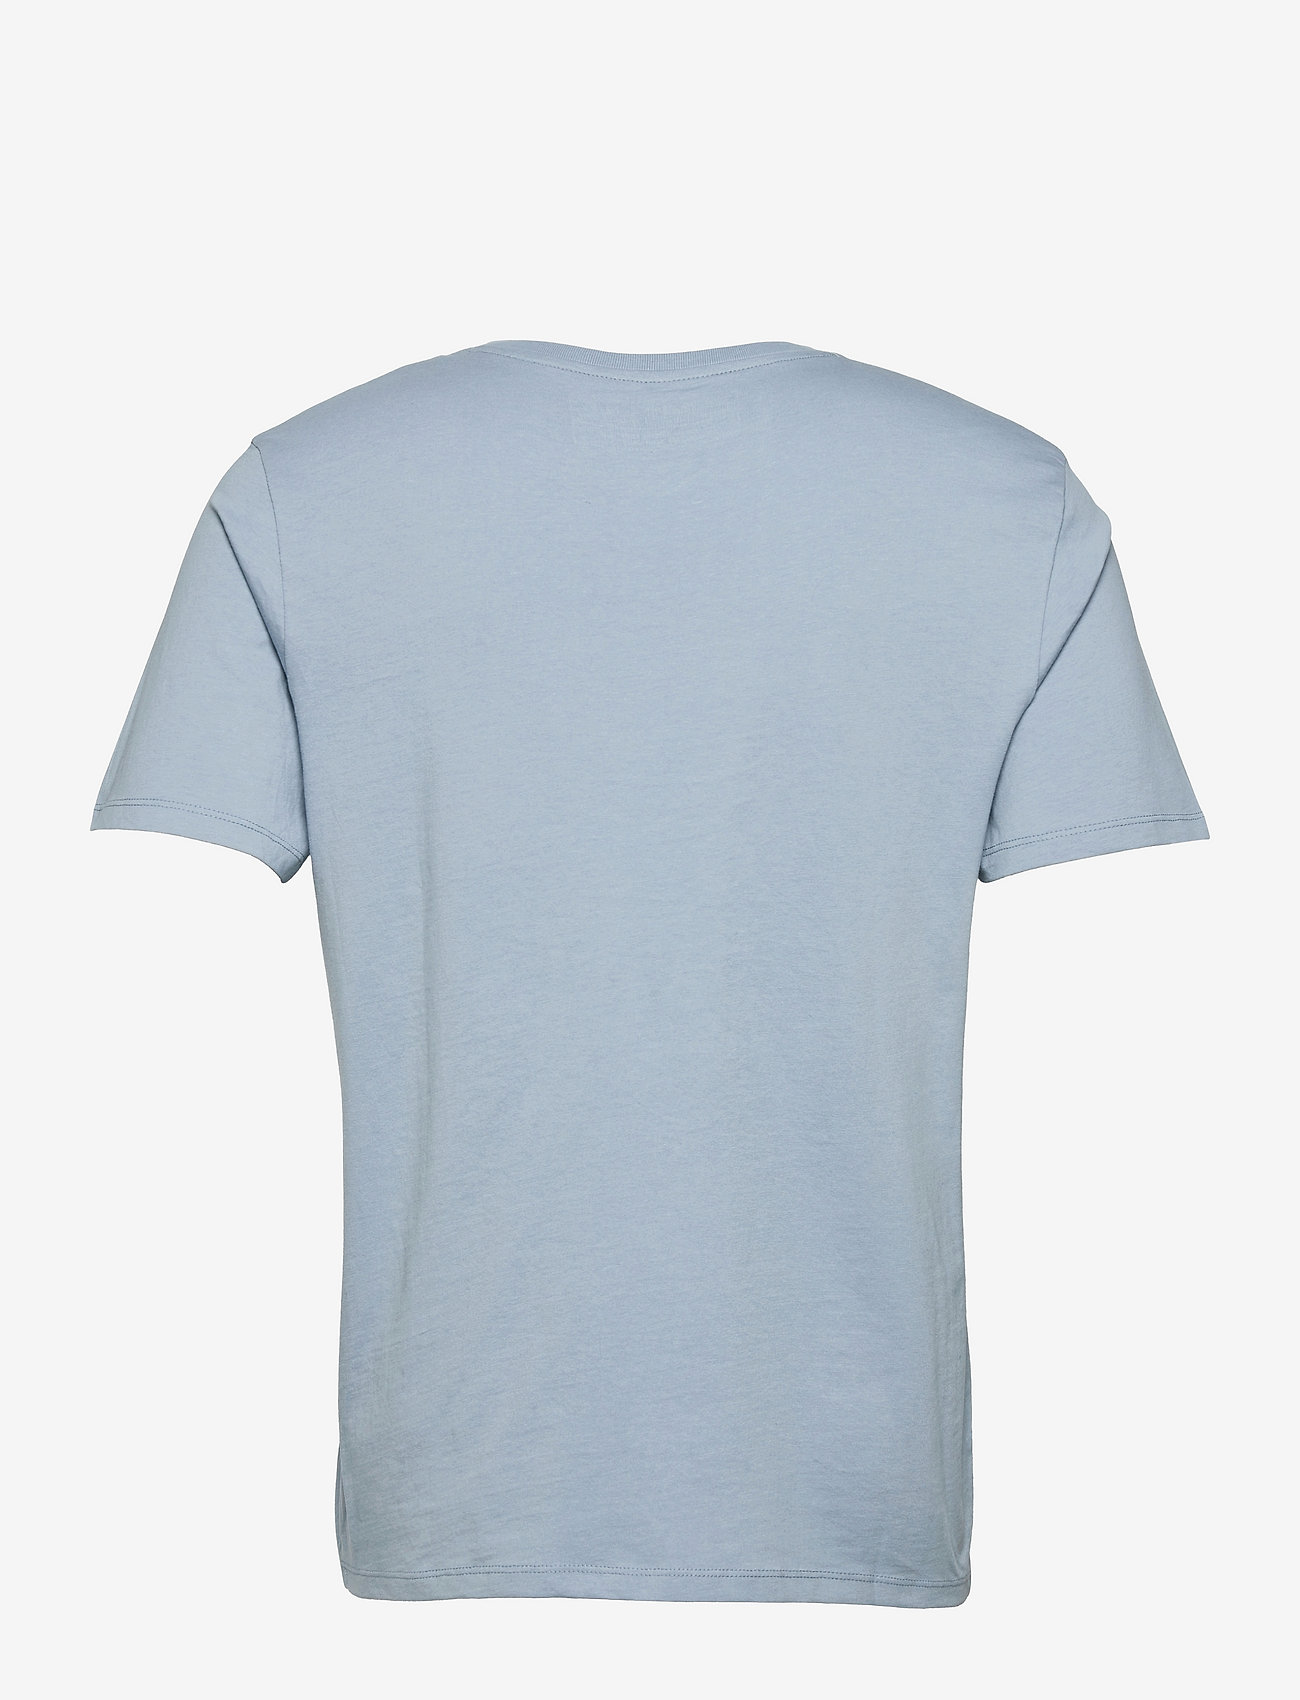 Timberland - Graphic Tee Horizon - t-shirts à manches courtes - ashley blue - 1